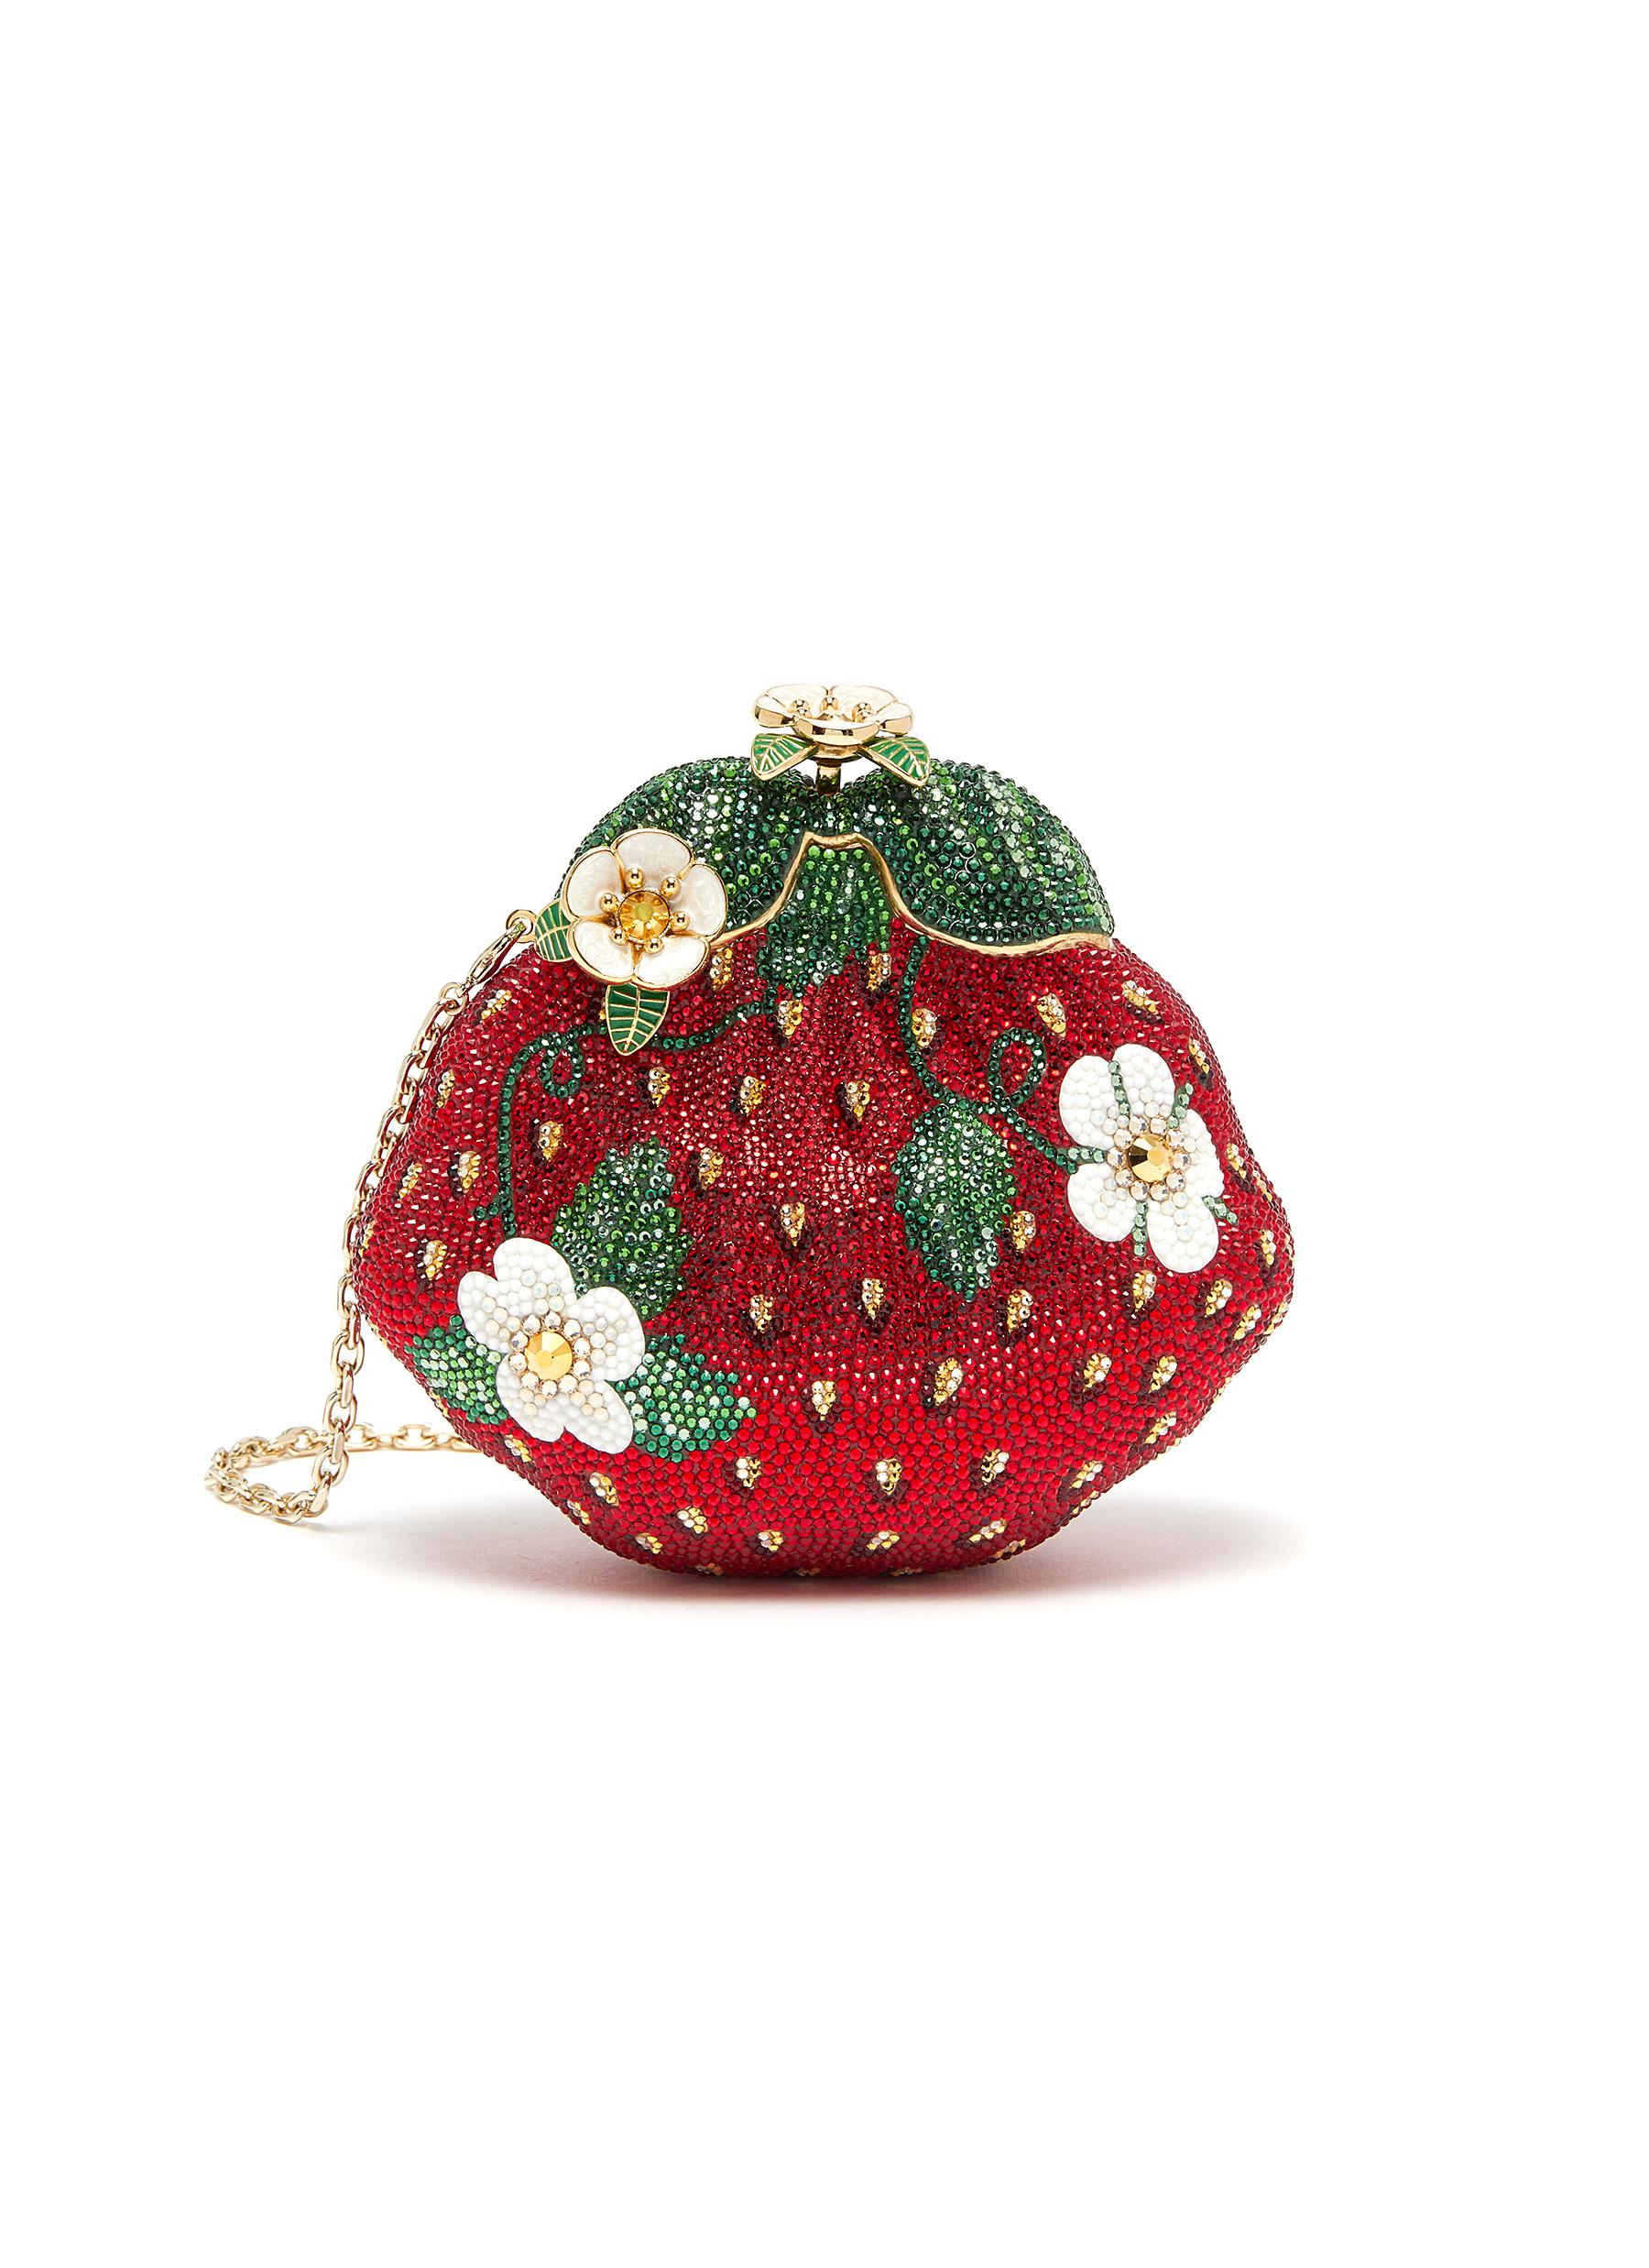 Floral Strawberry Embellished Clutch